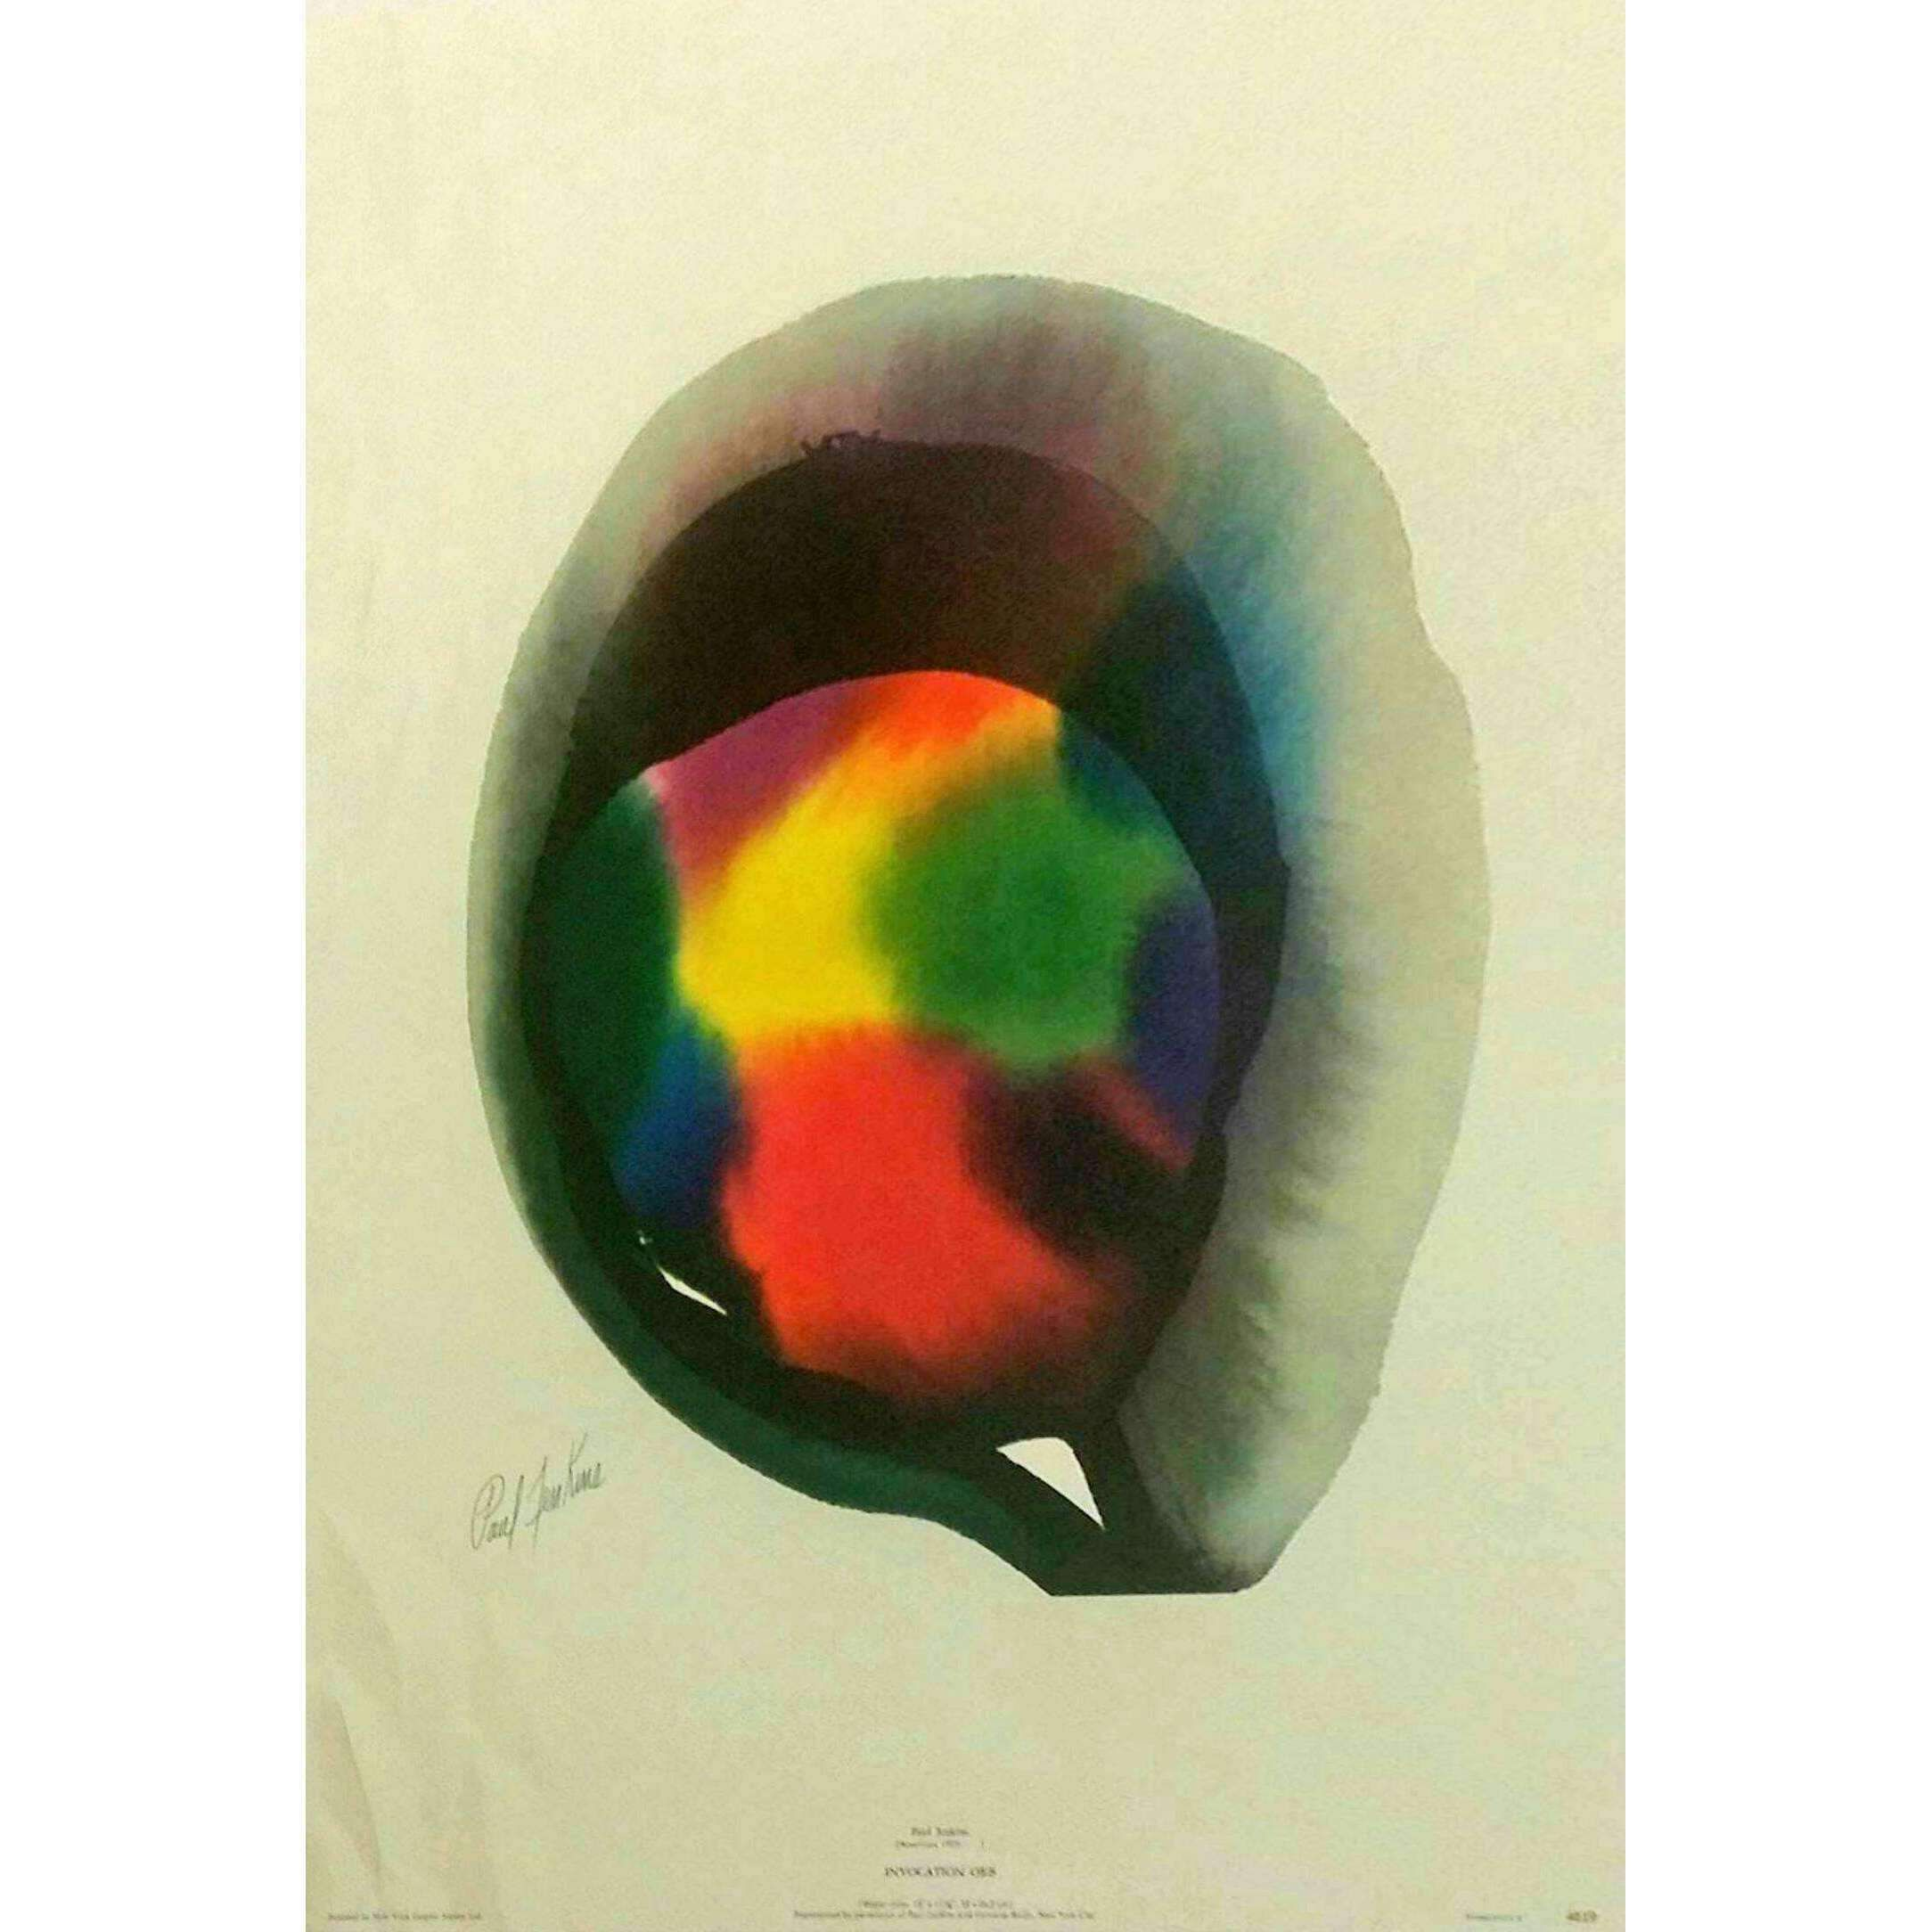 Paul jenkins invocation orb 1962 lithograph art prints